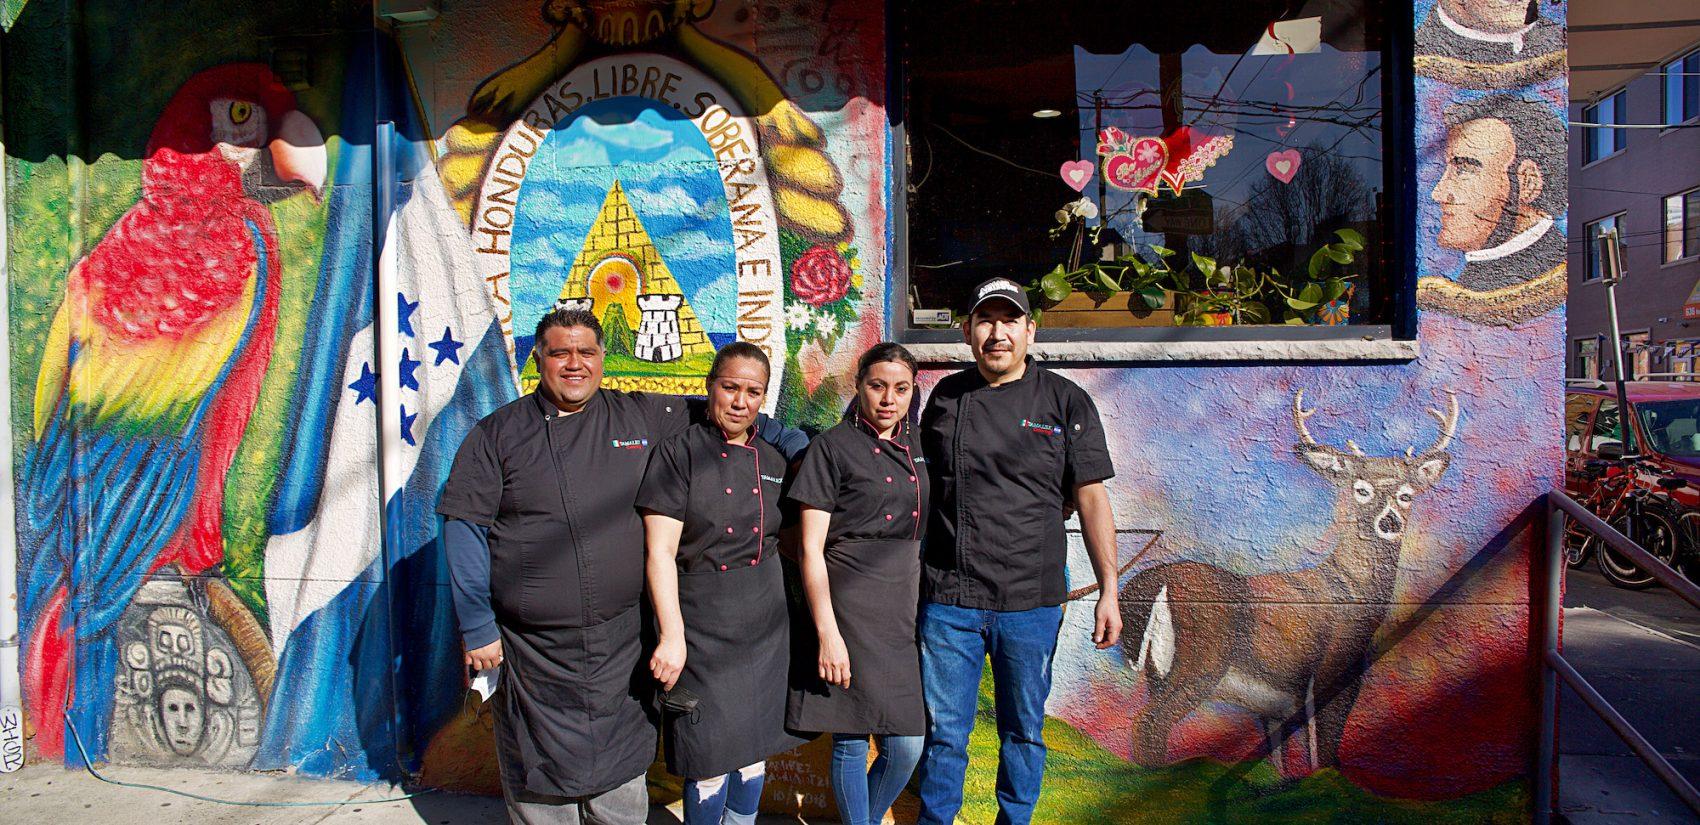 The Tamalex owners are committed to employing from their community, and often hire immigrant women to work at their restaurant. | Los dueños de Tamalex están comprometidos a emplear a personas de su comunidad y contratan mujeres inmigrantes para que trabajen en su restaurante. (Tony Rocco/WHYY)